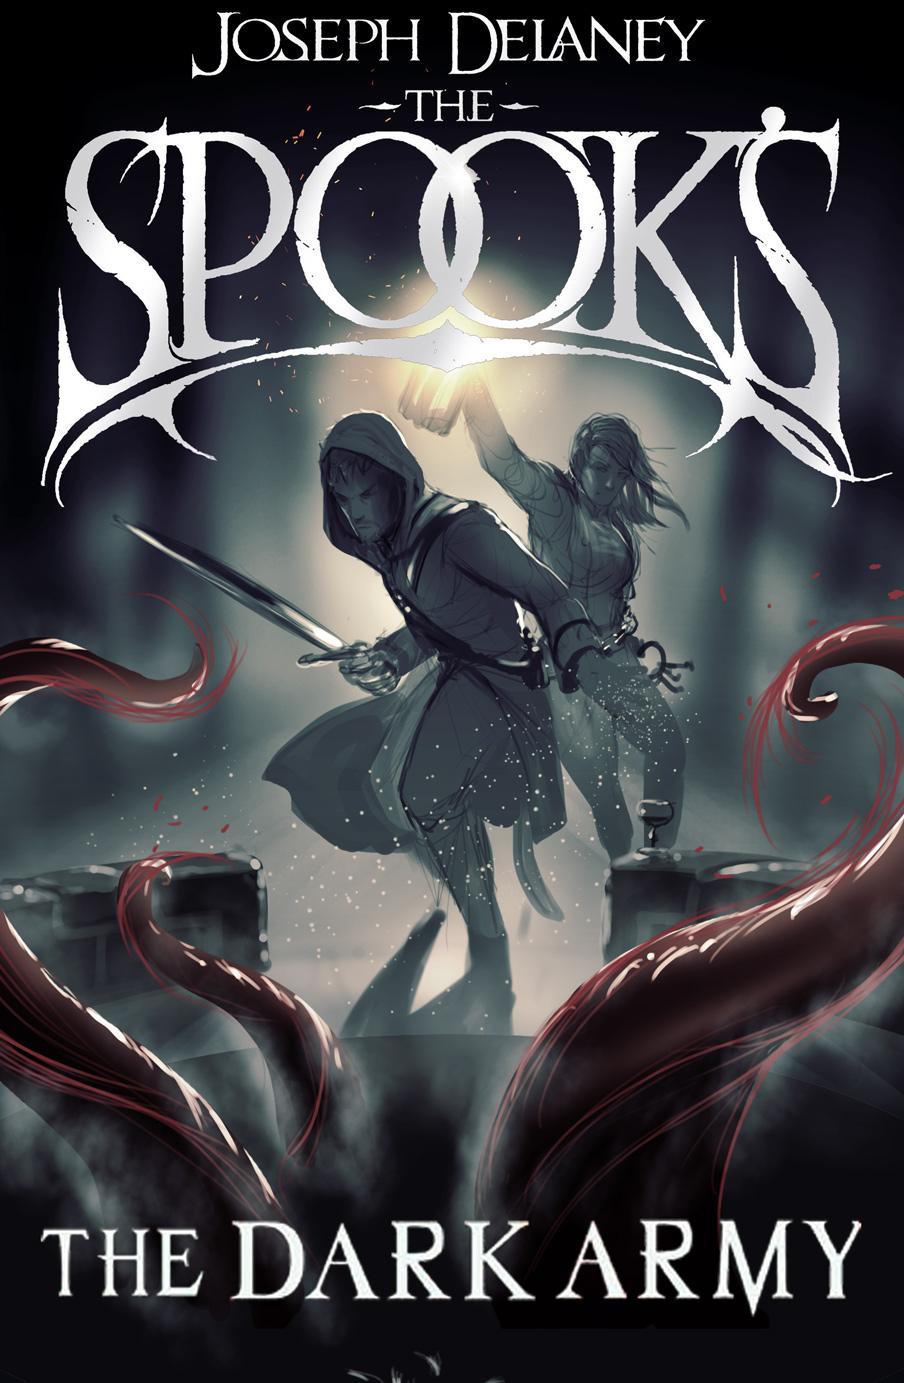 book cover spook spook's Joseph Delaney delaney penguin random house Dark Fantasy